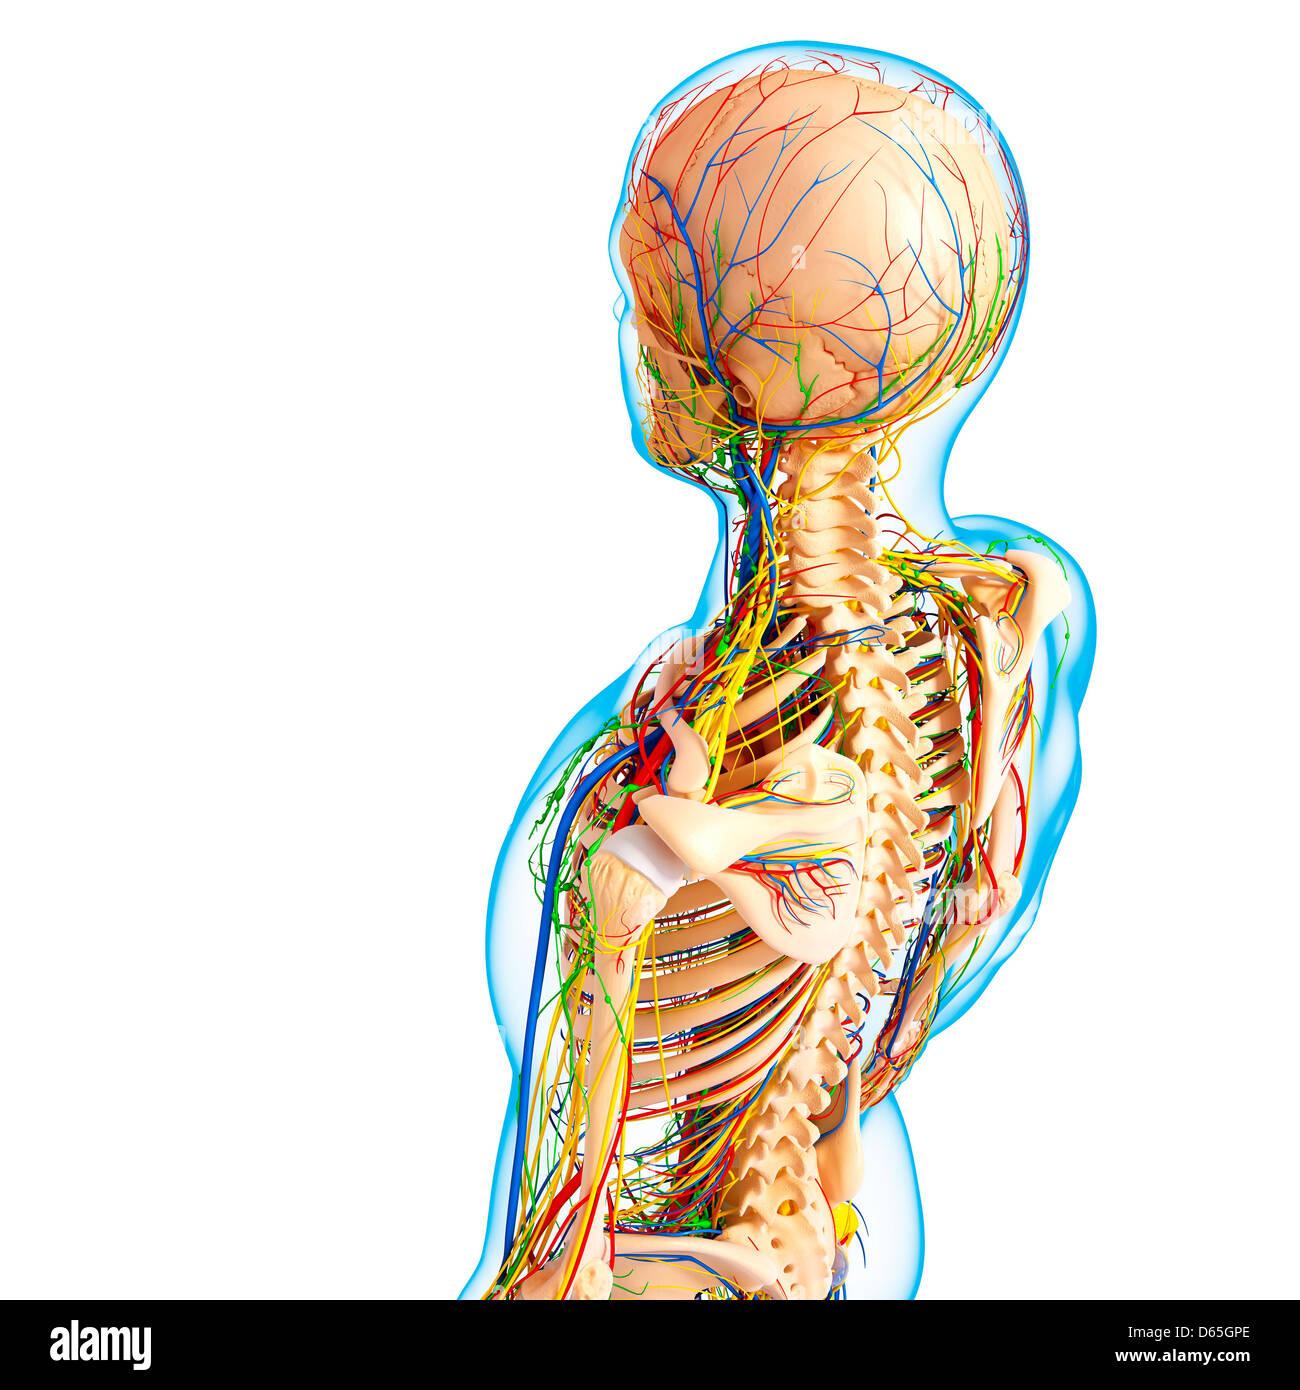 Anatomy Human Skull Rear View Stockfotos & Anatomy Human Skull Rear ...